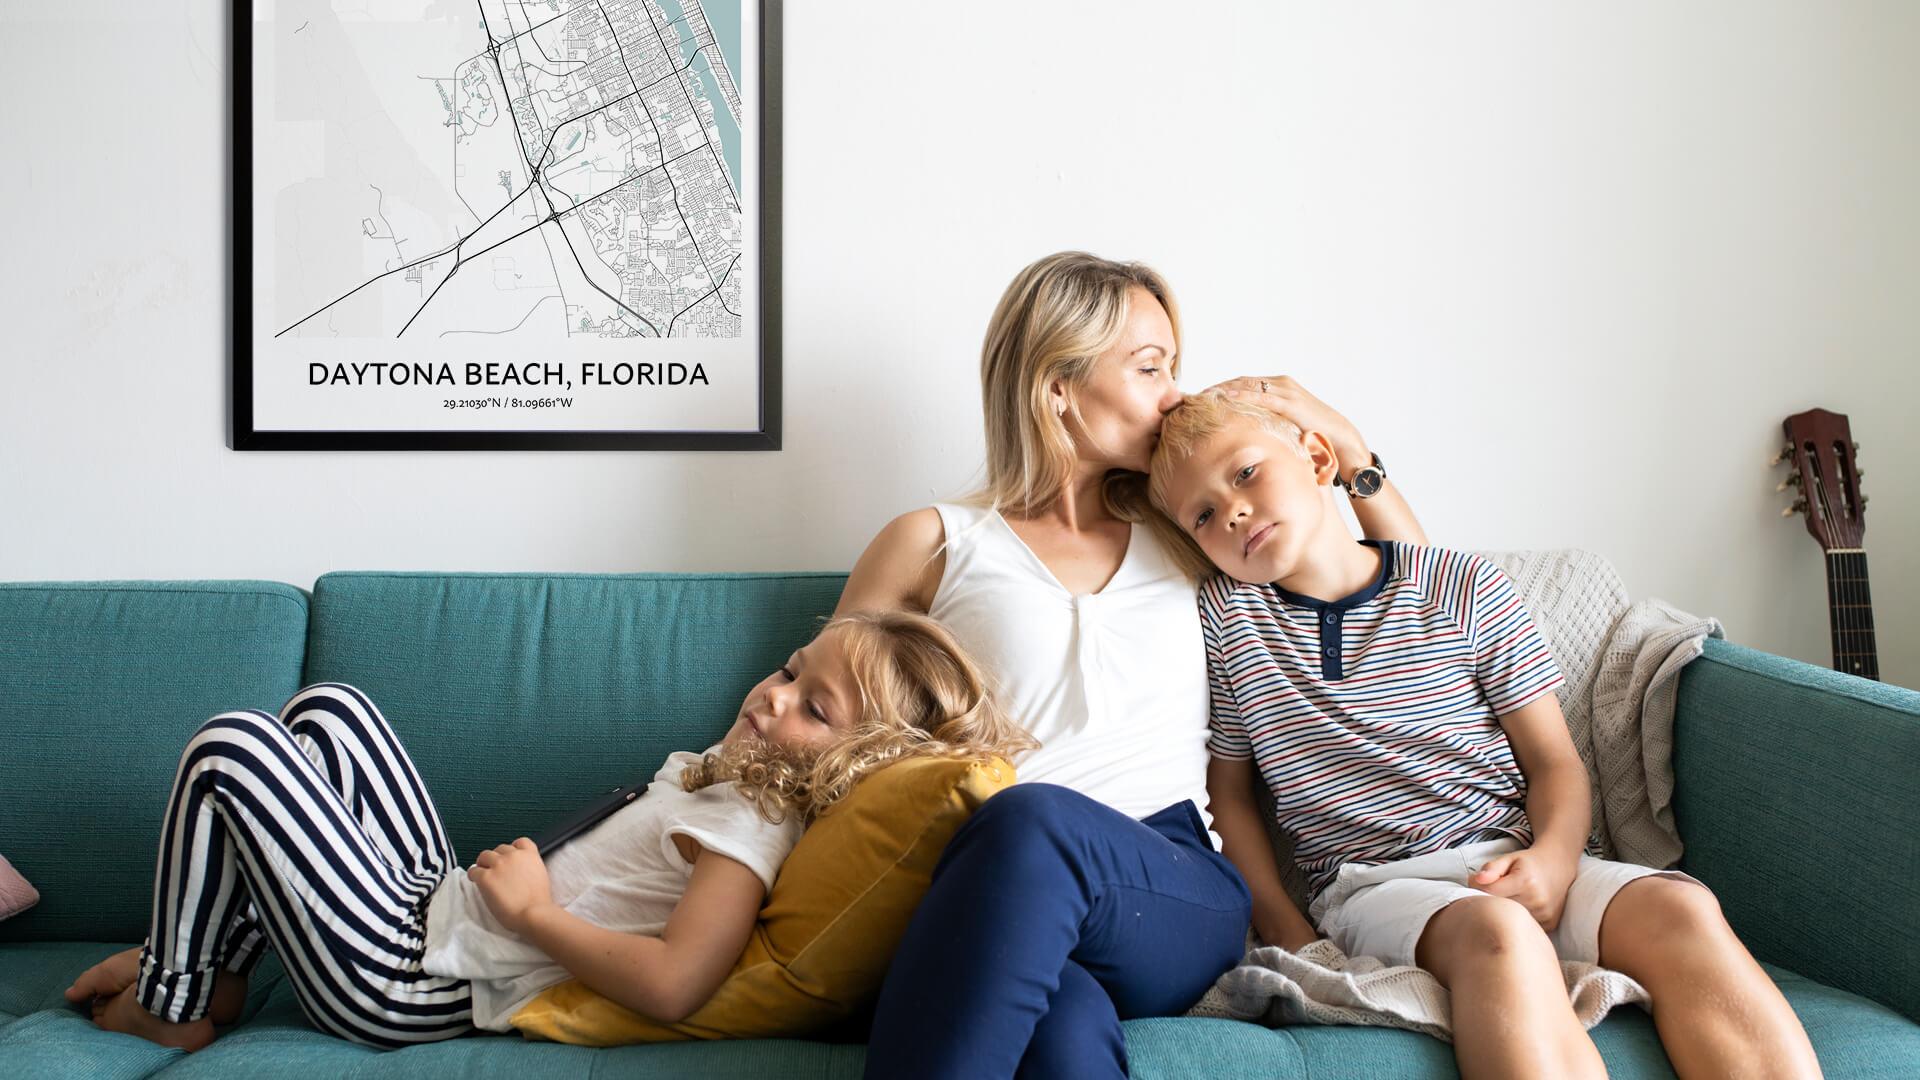 Daytona Beach map poster